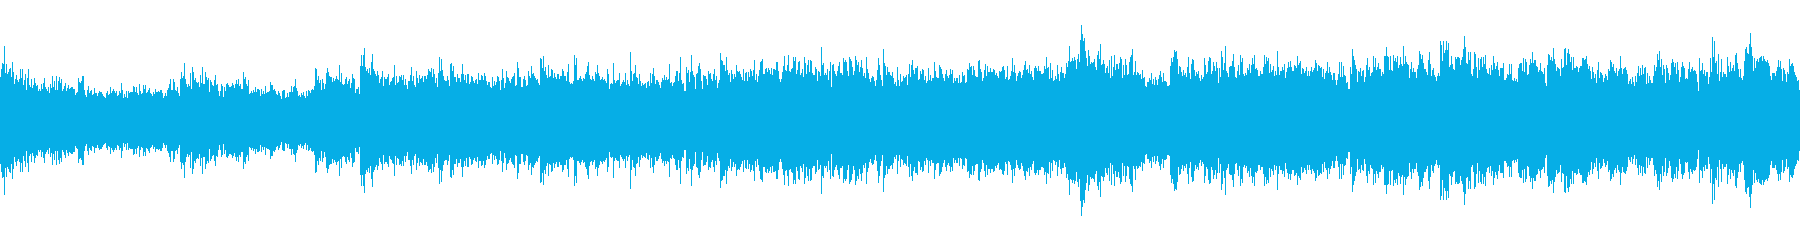 YAMATO_60secの再生済みの波形